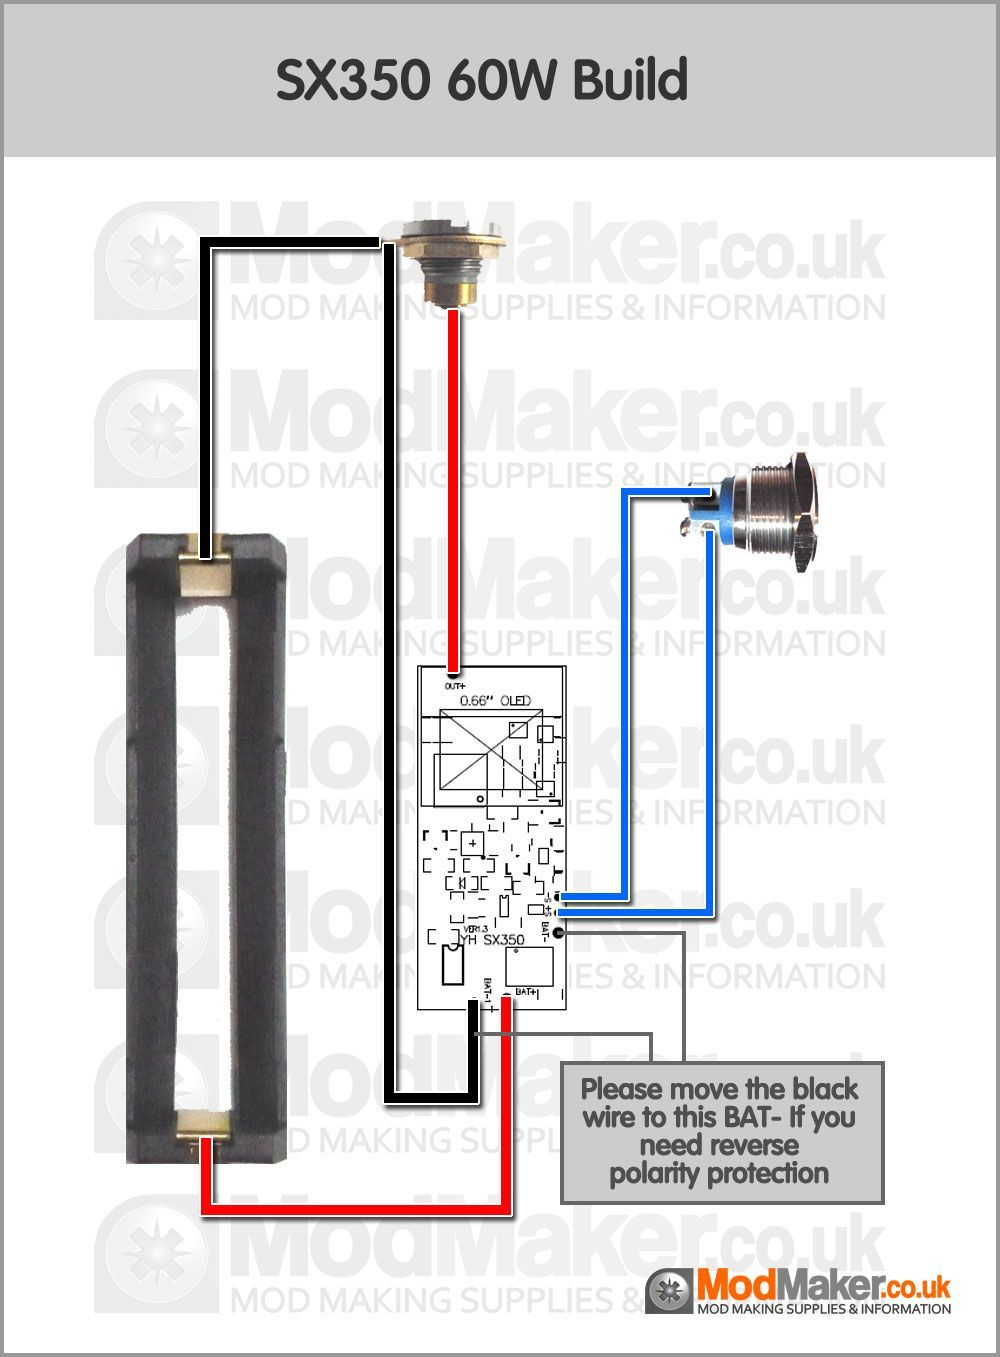 wiring diagram for dual 18650 box mod wiring diagram world wiring diagram 18650 mod [ 1000 x 1357 Pixel ]